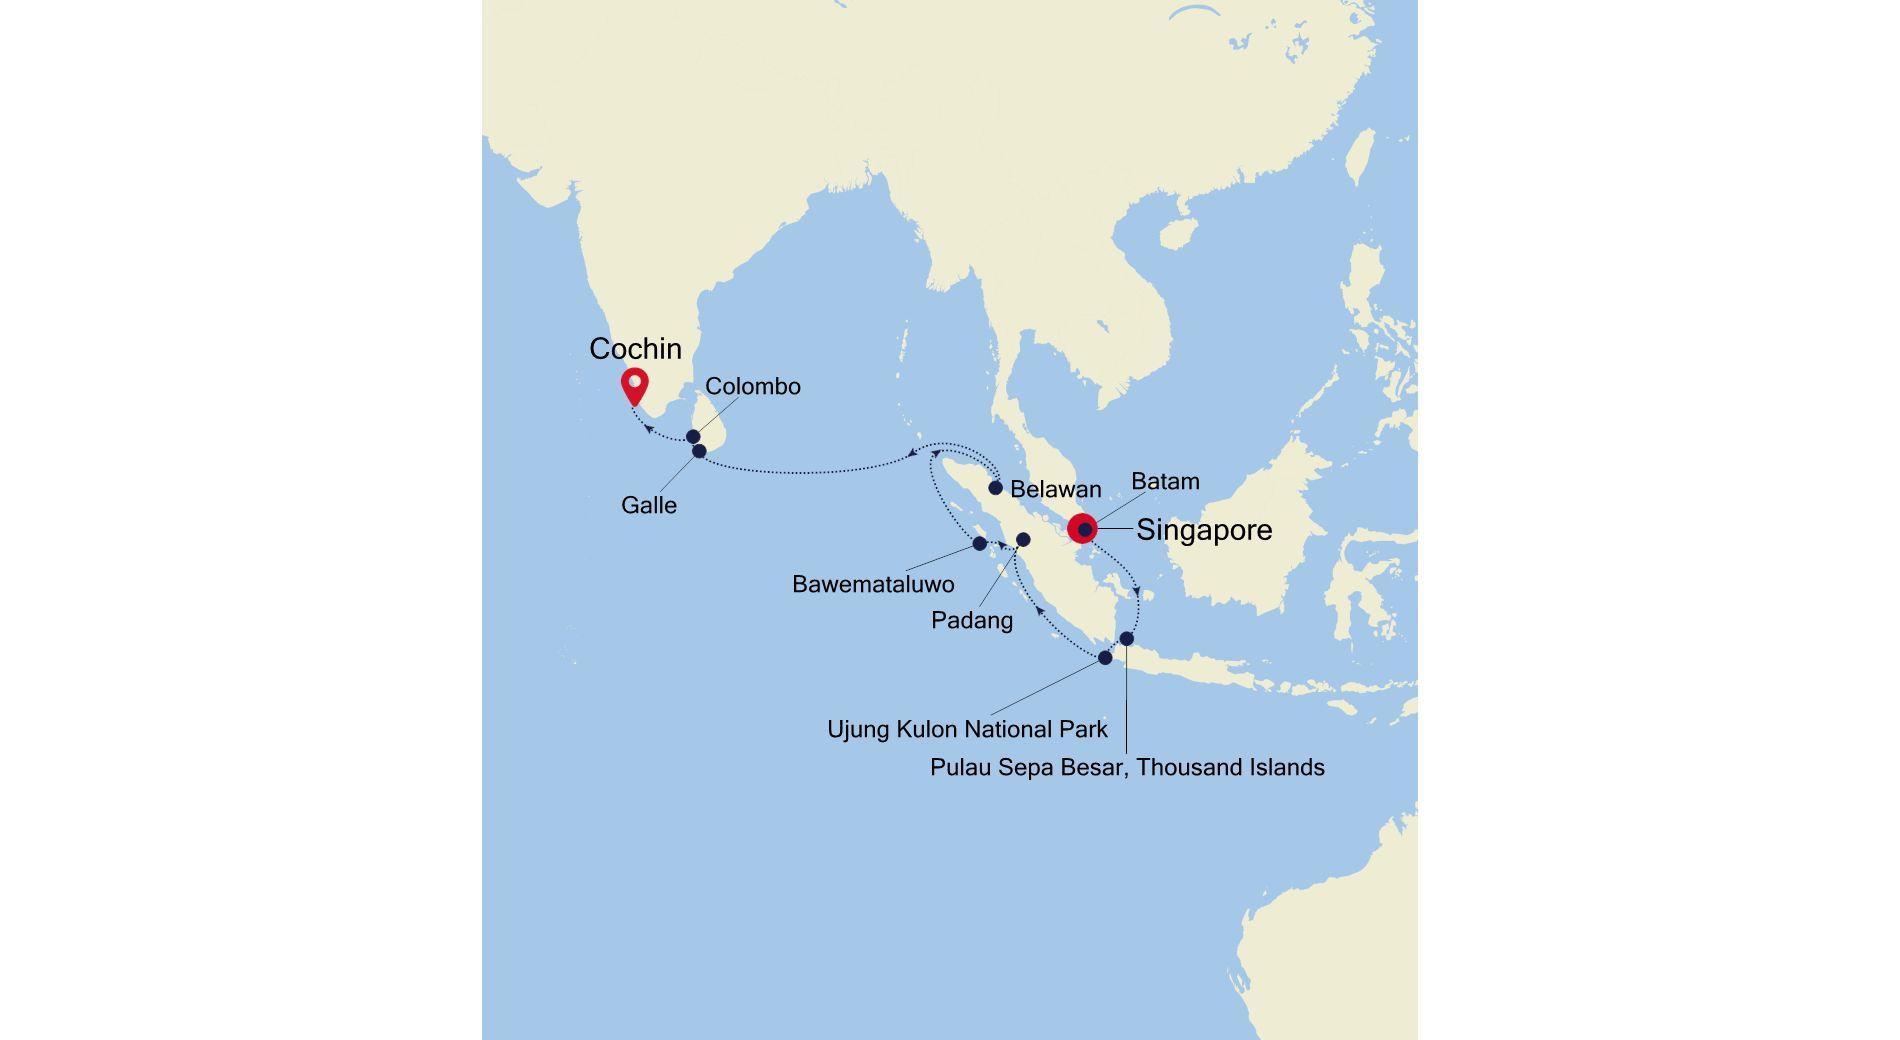 E4220423016 - Singapore à Cochin